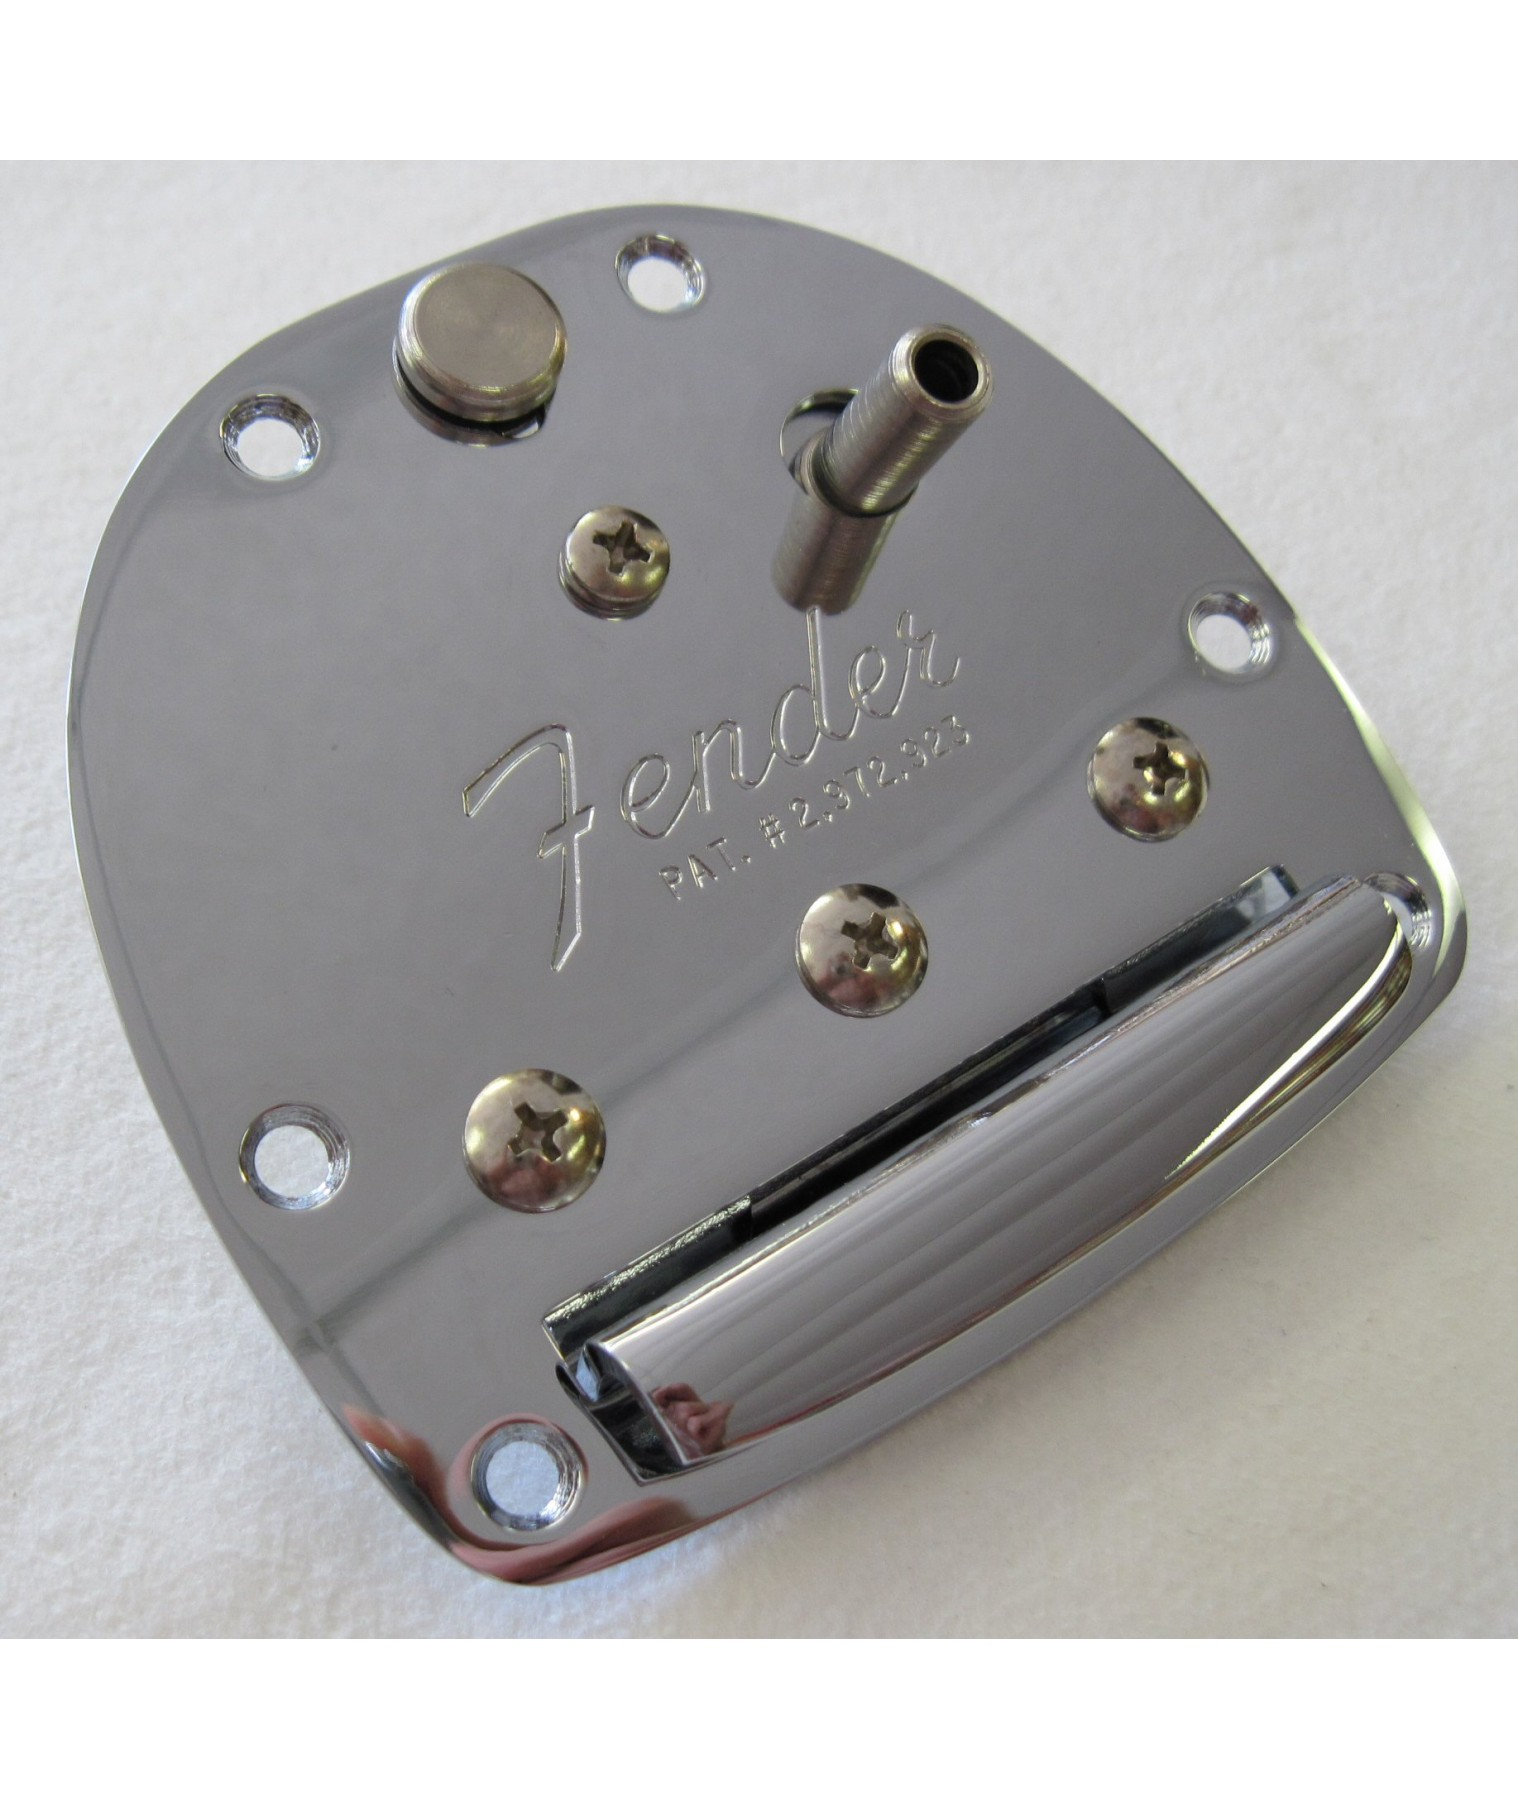 Fender USA Vintage Series Jazzmaster/Jaguar Vibrato Unit AVRI 0054466000